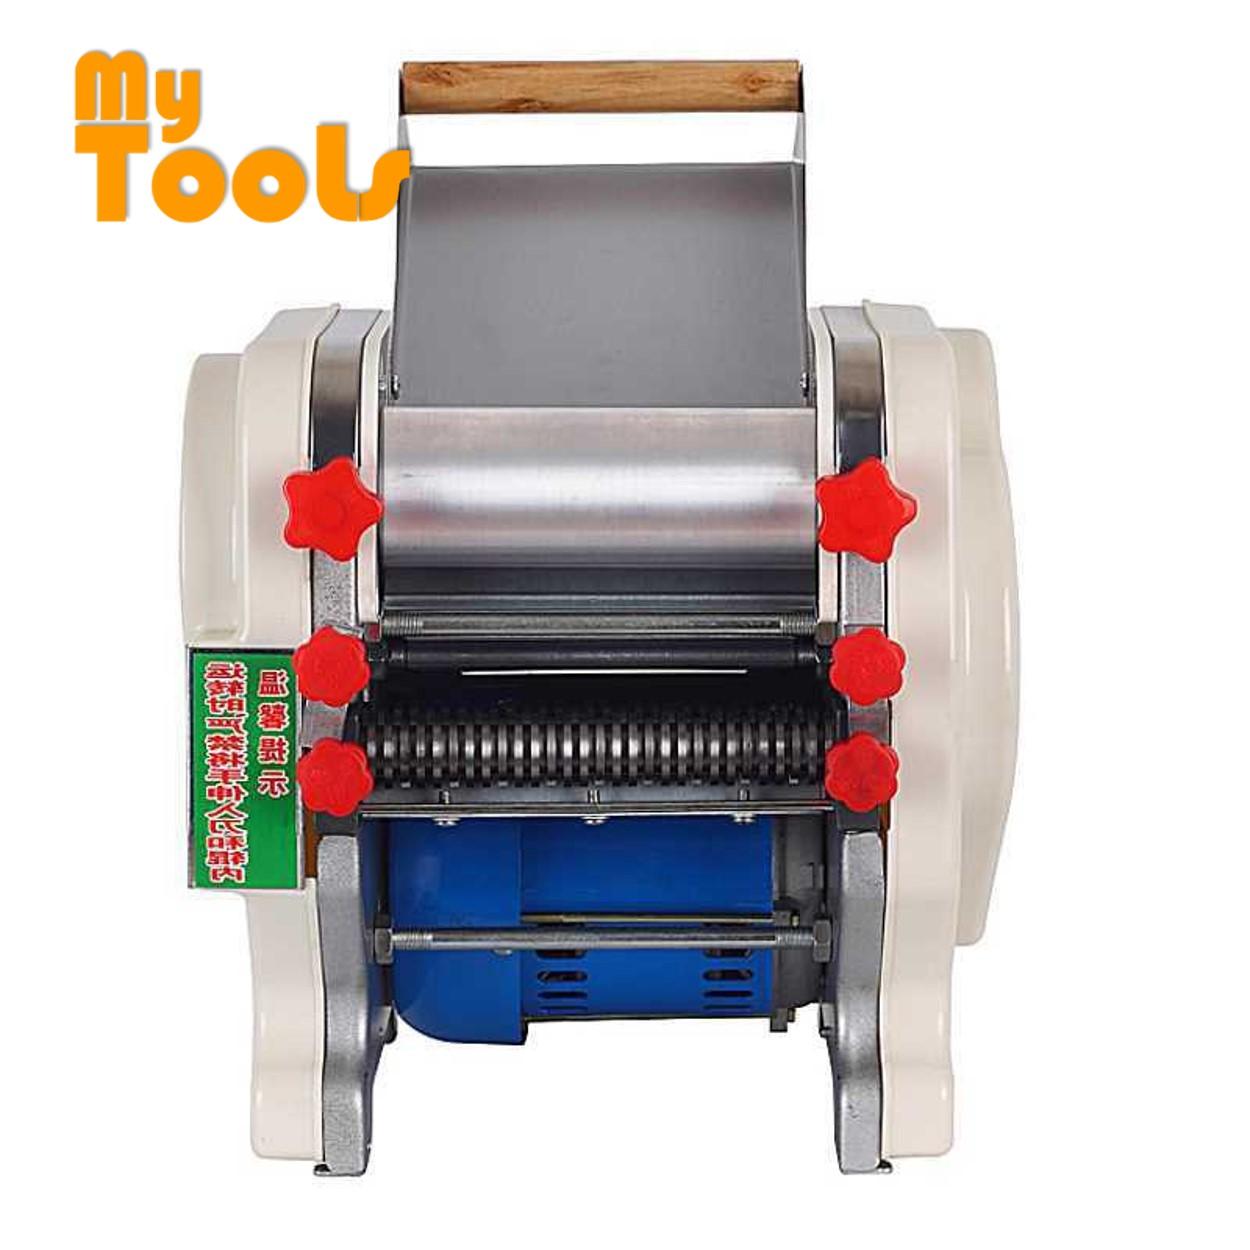 Mytools Stainless Steel Noodles Maker Machine Dough Sheeter Cutter Pasta Pan Mee